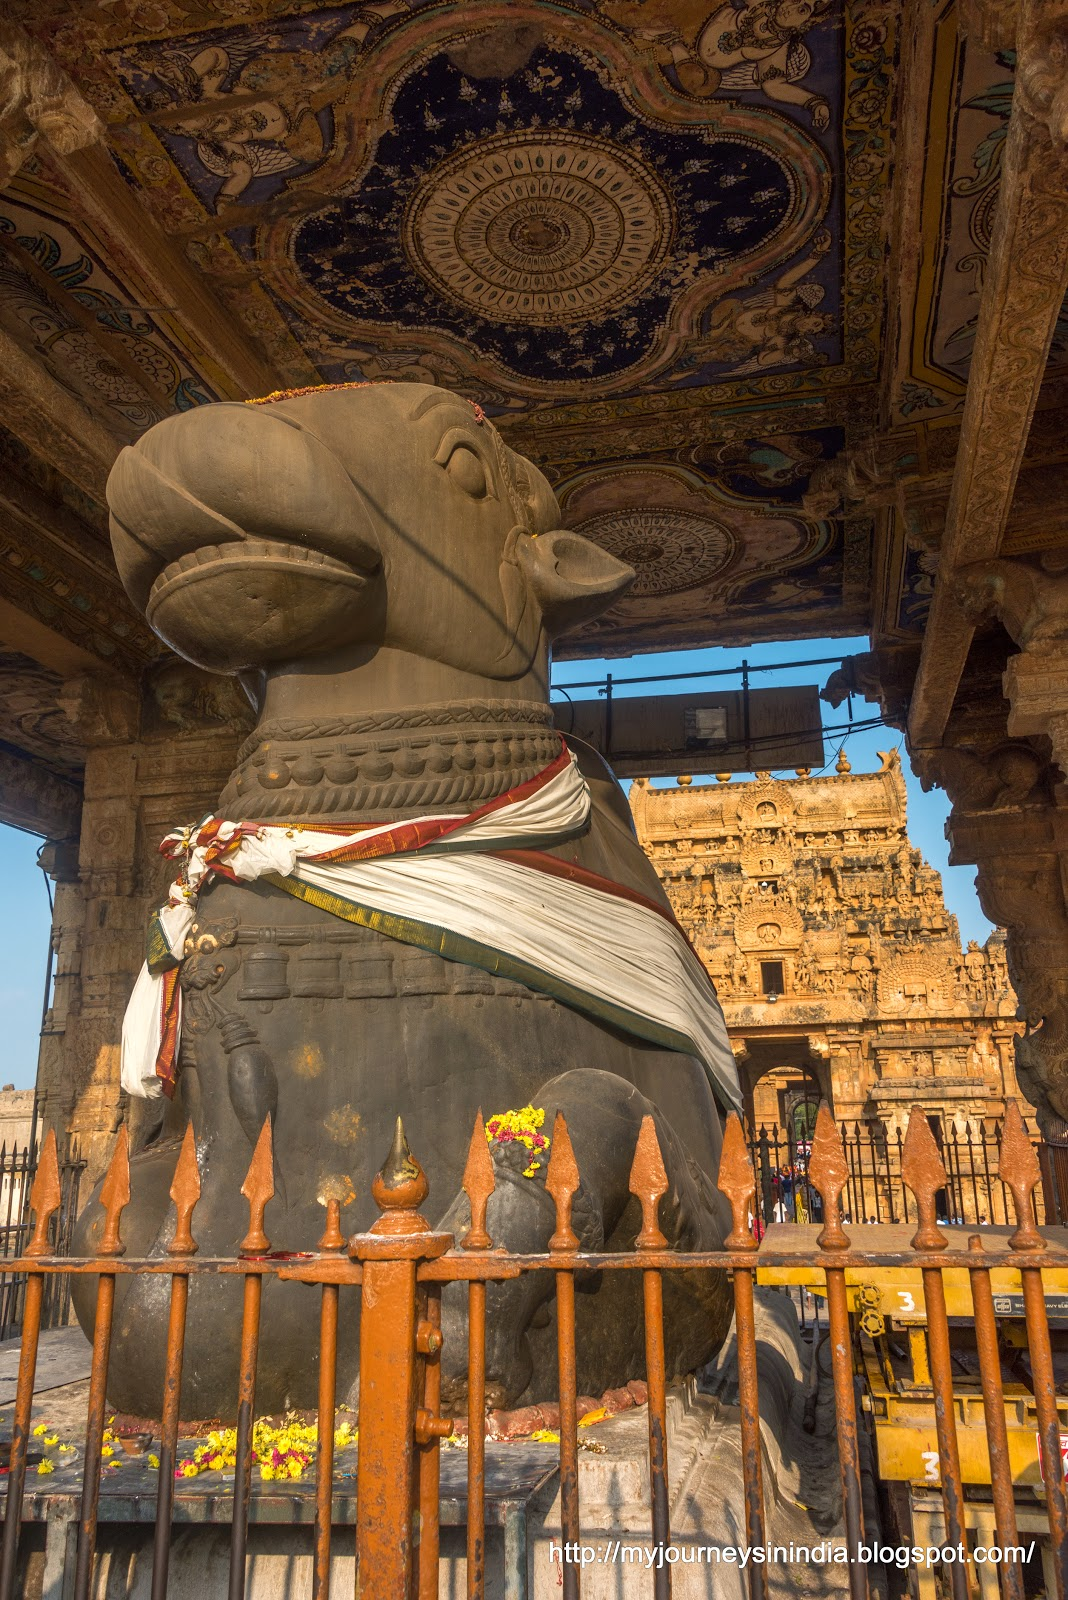 Thanjavur Brihadeeswarar Temple Big Nandi Mantap Roof Paintings